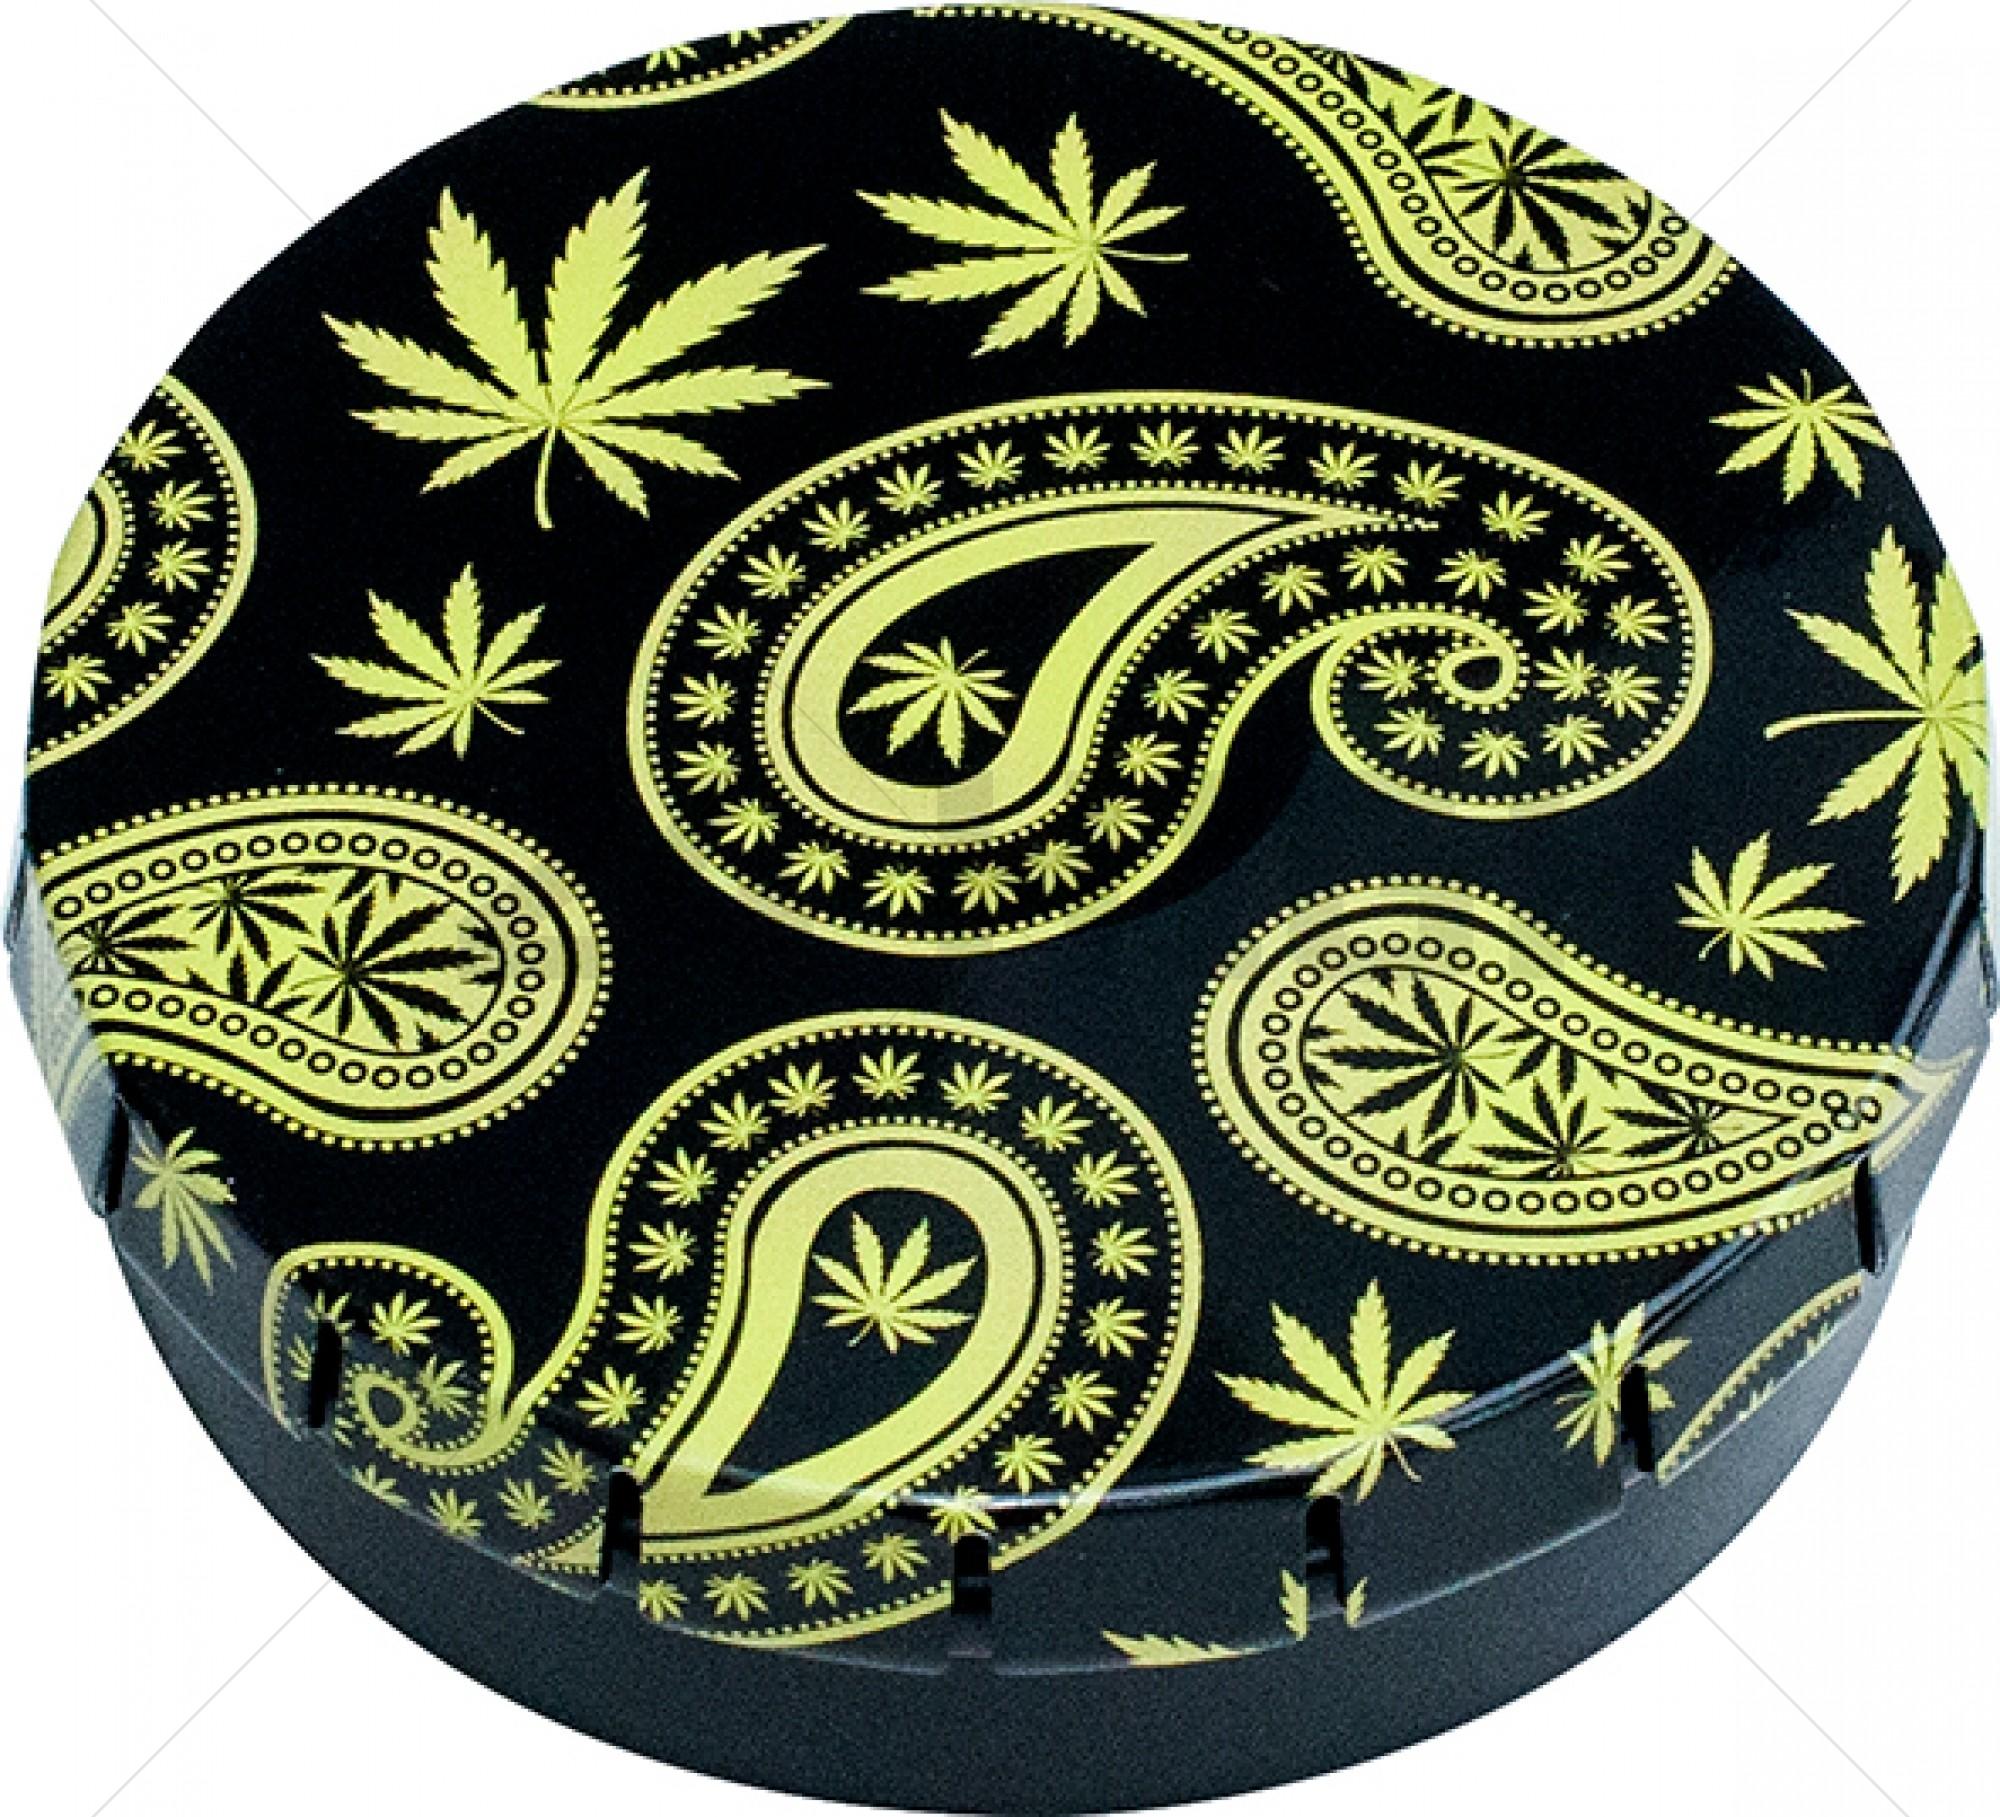 Click-Clack Box (Ø 5,5 cm) Paisley Weed